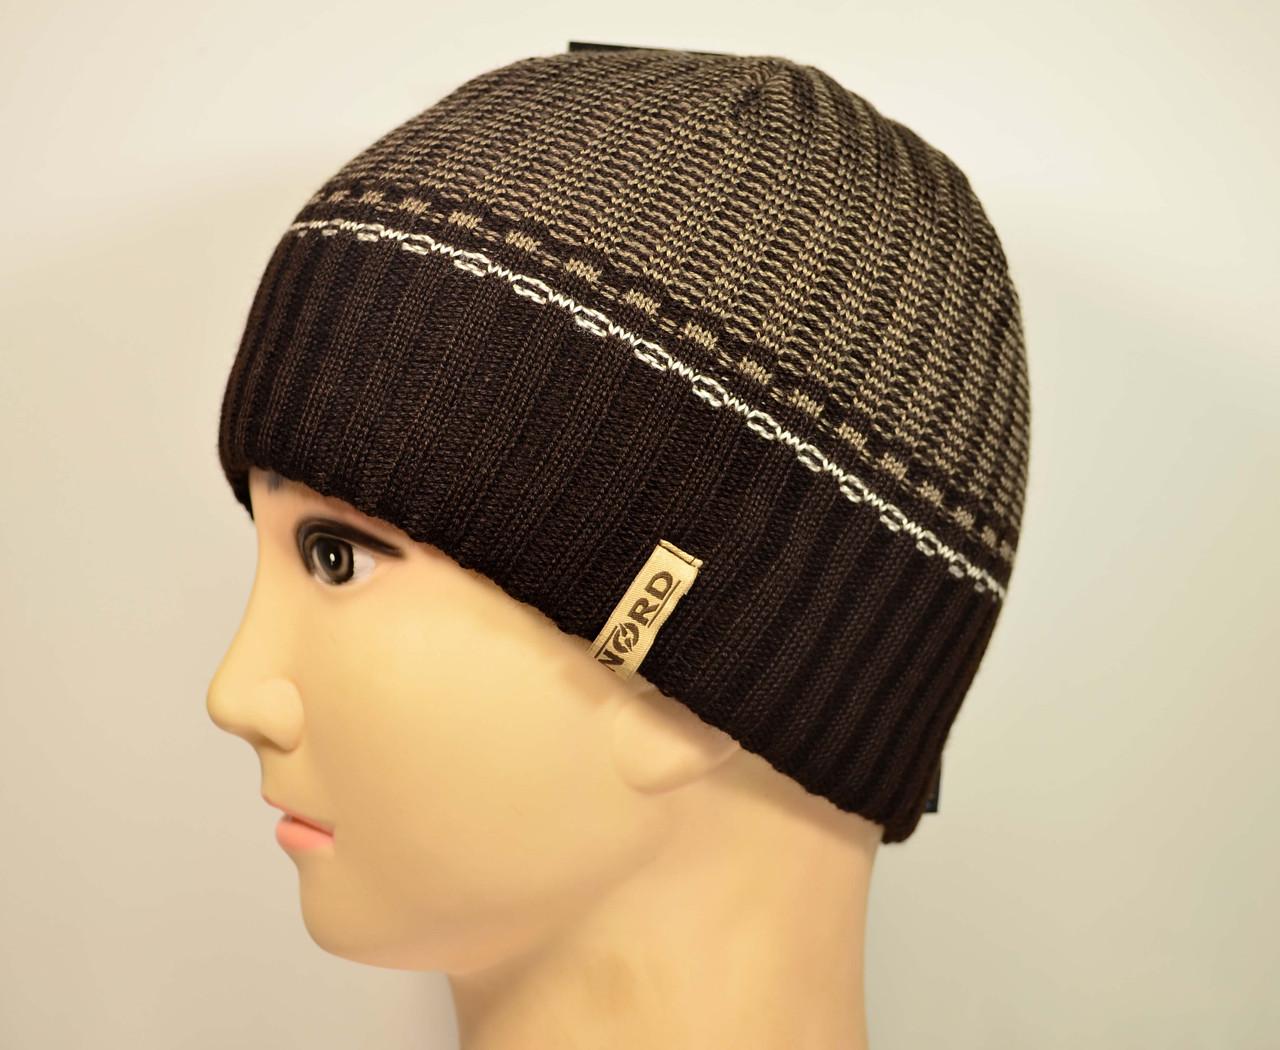 Мужская вязанная шапка на флисе, оптом, Nord